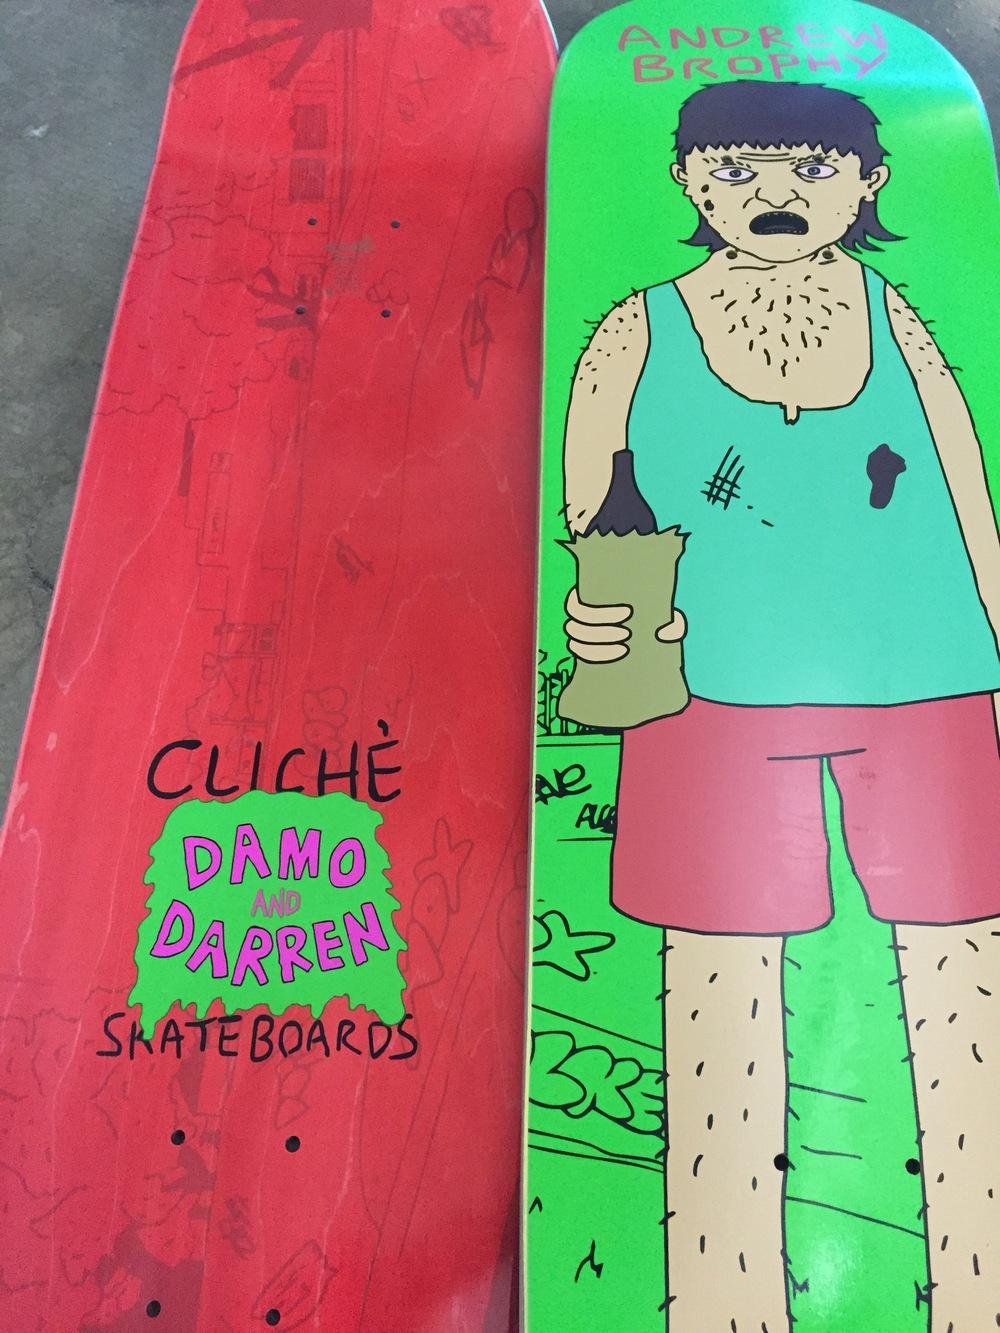 Cliché Skateboards x Damo & Darren Collab 4